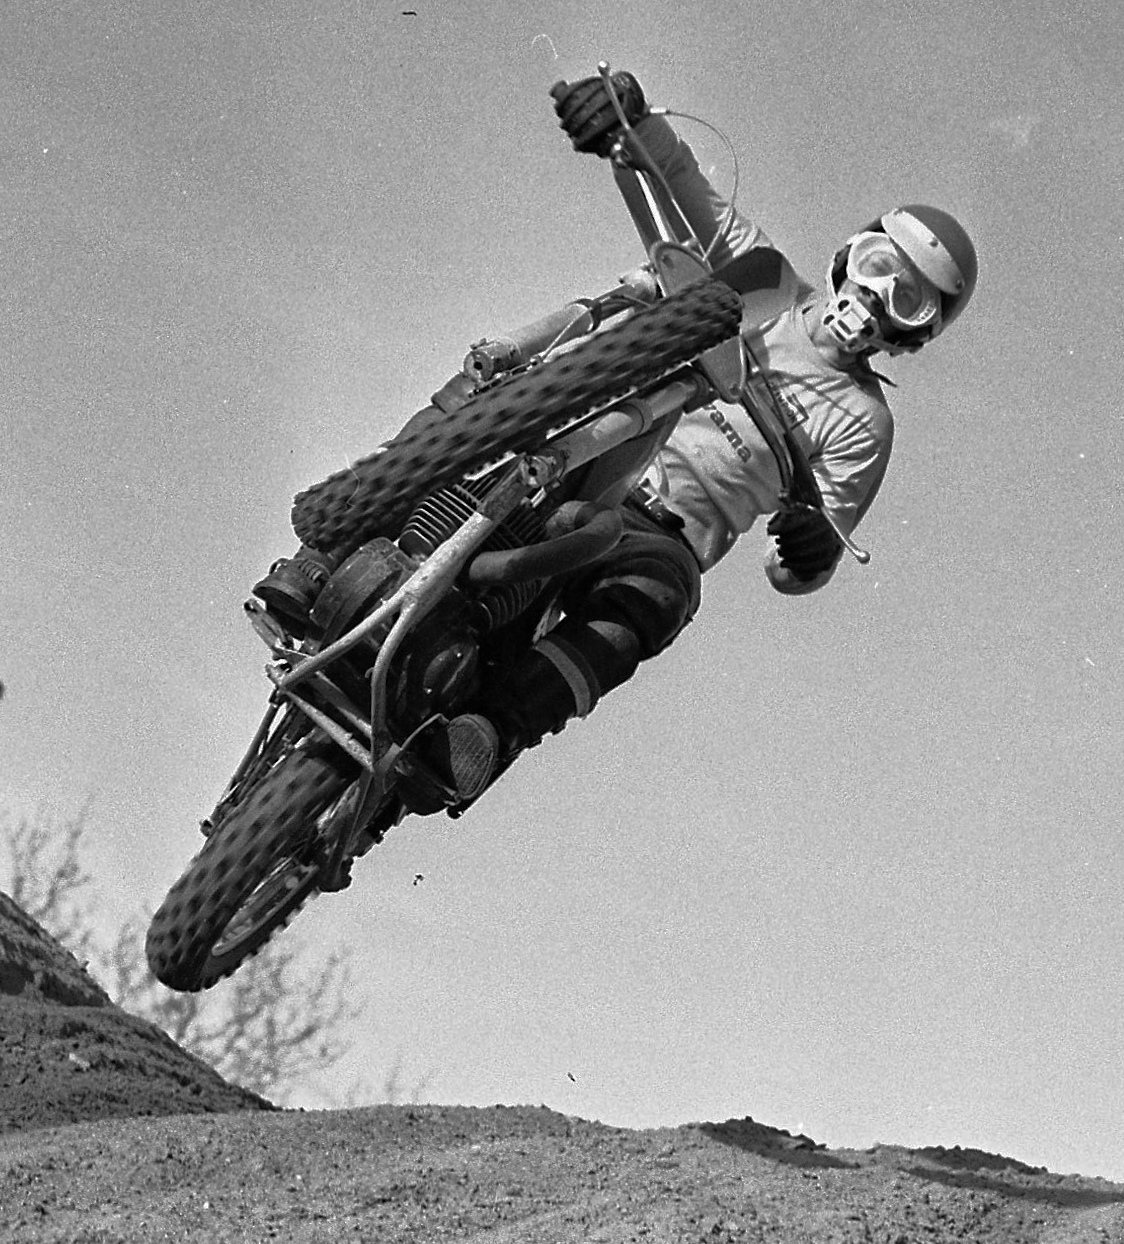 vintage-GP-1960s-5.jpg#asset:37235